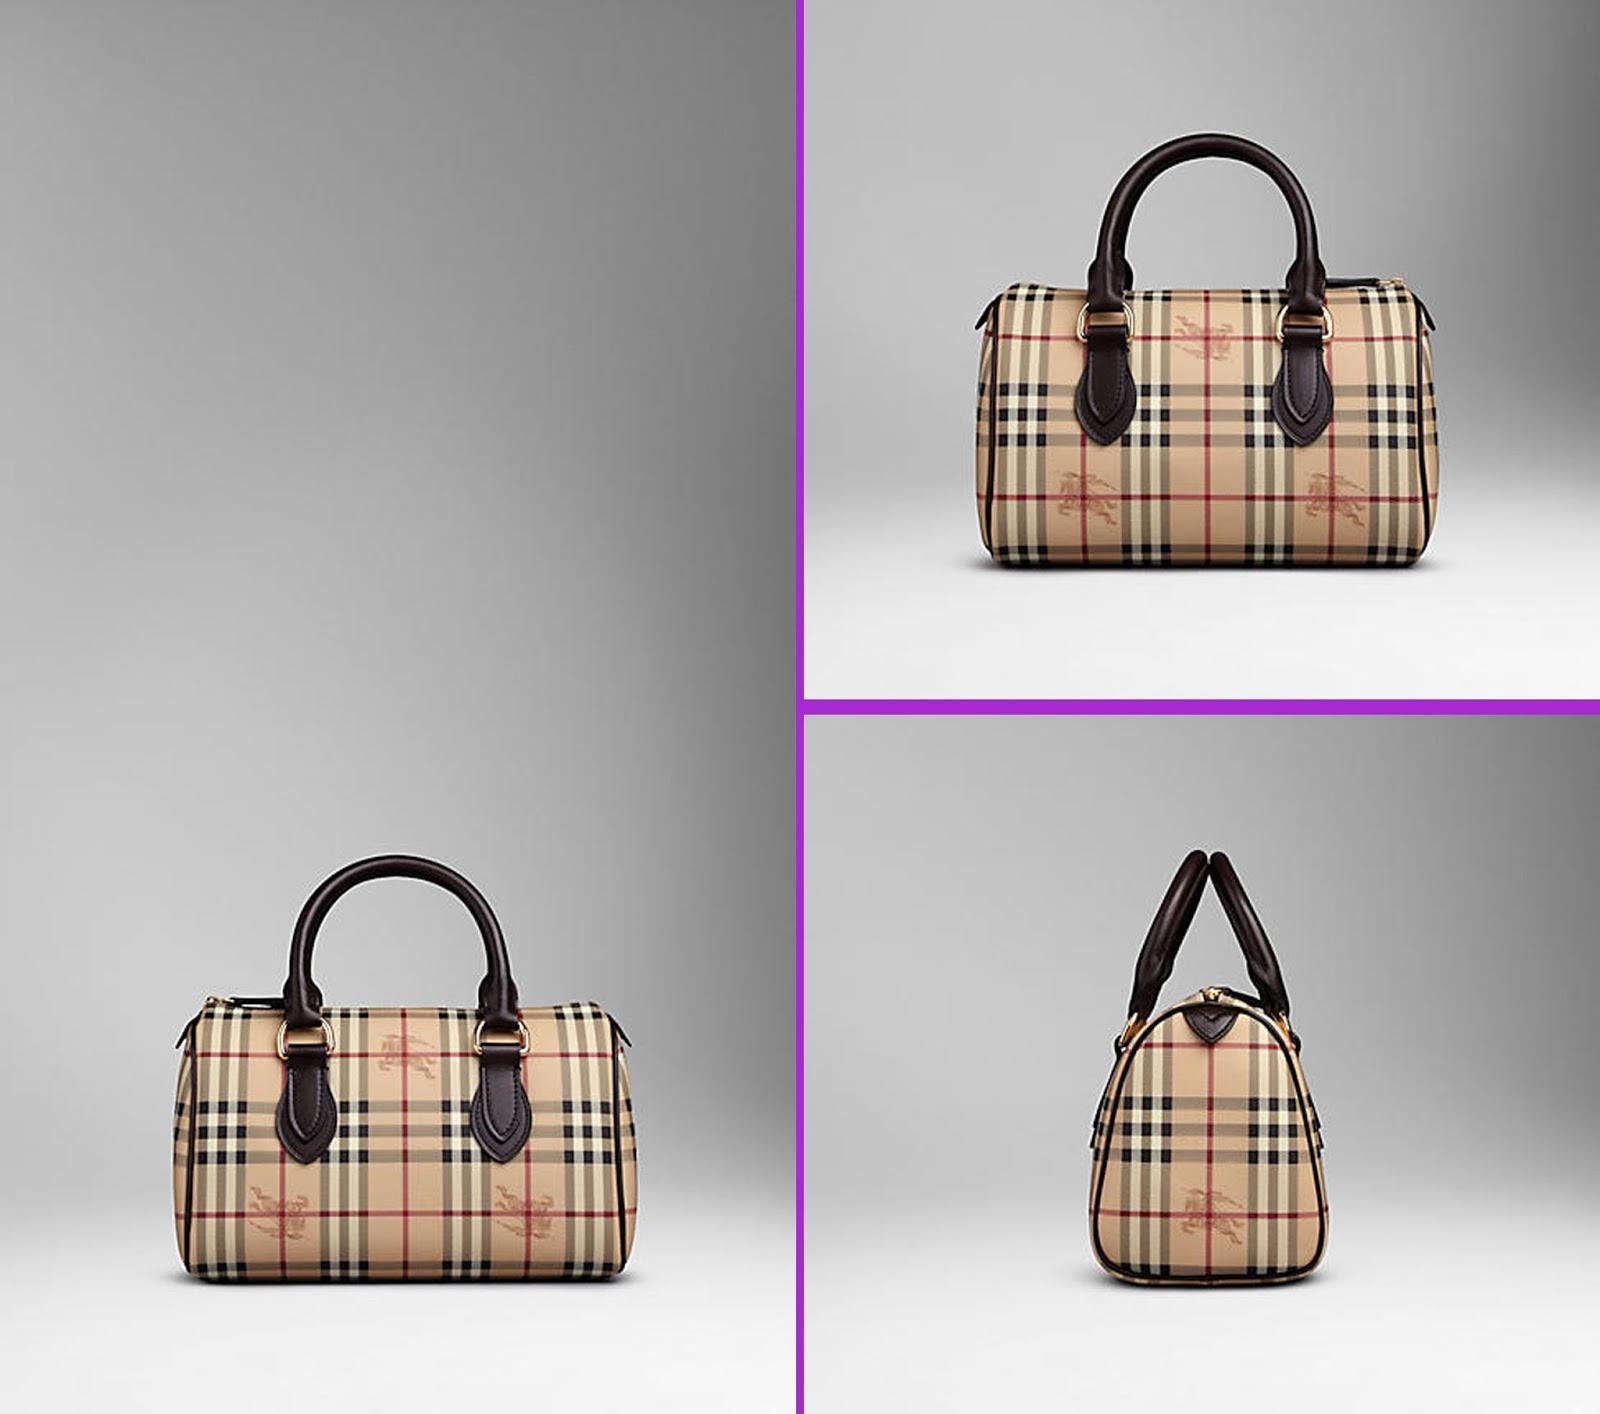 burberry bags outlet l5sr  burberry classic bag